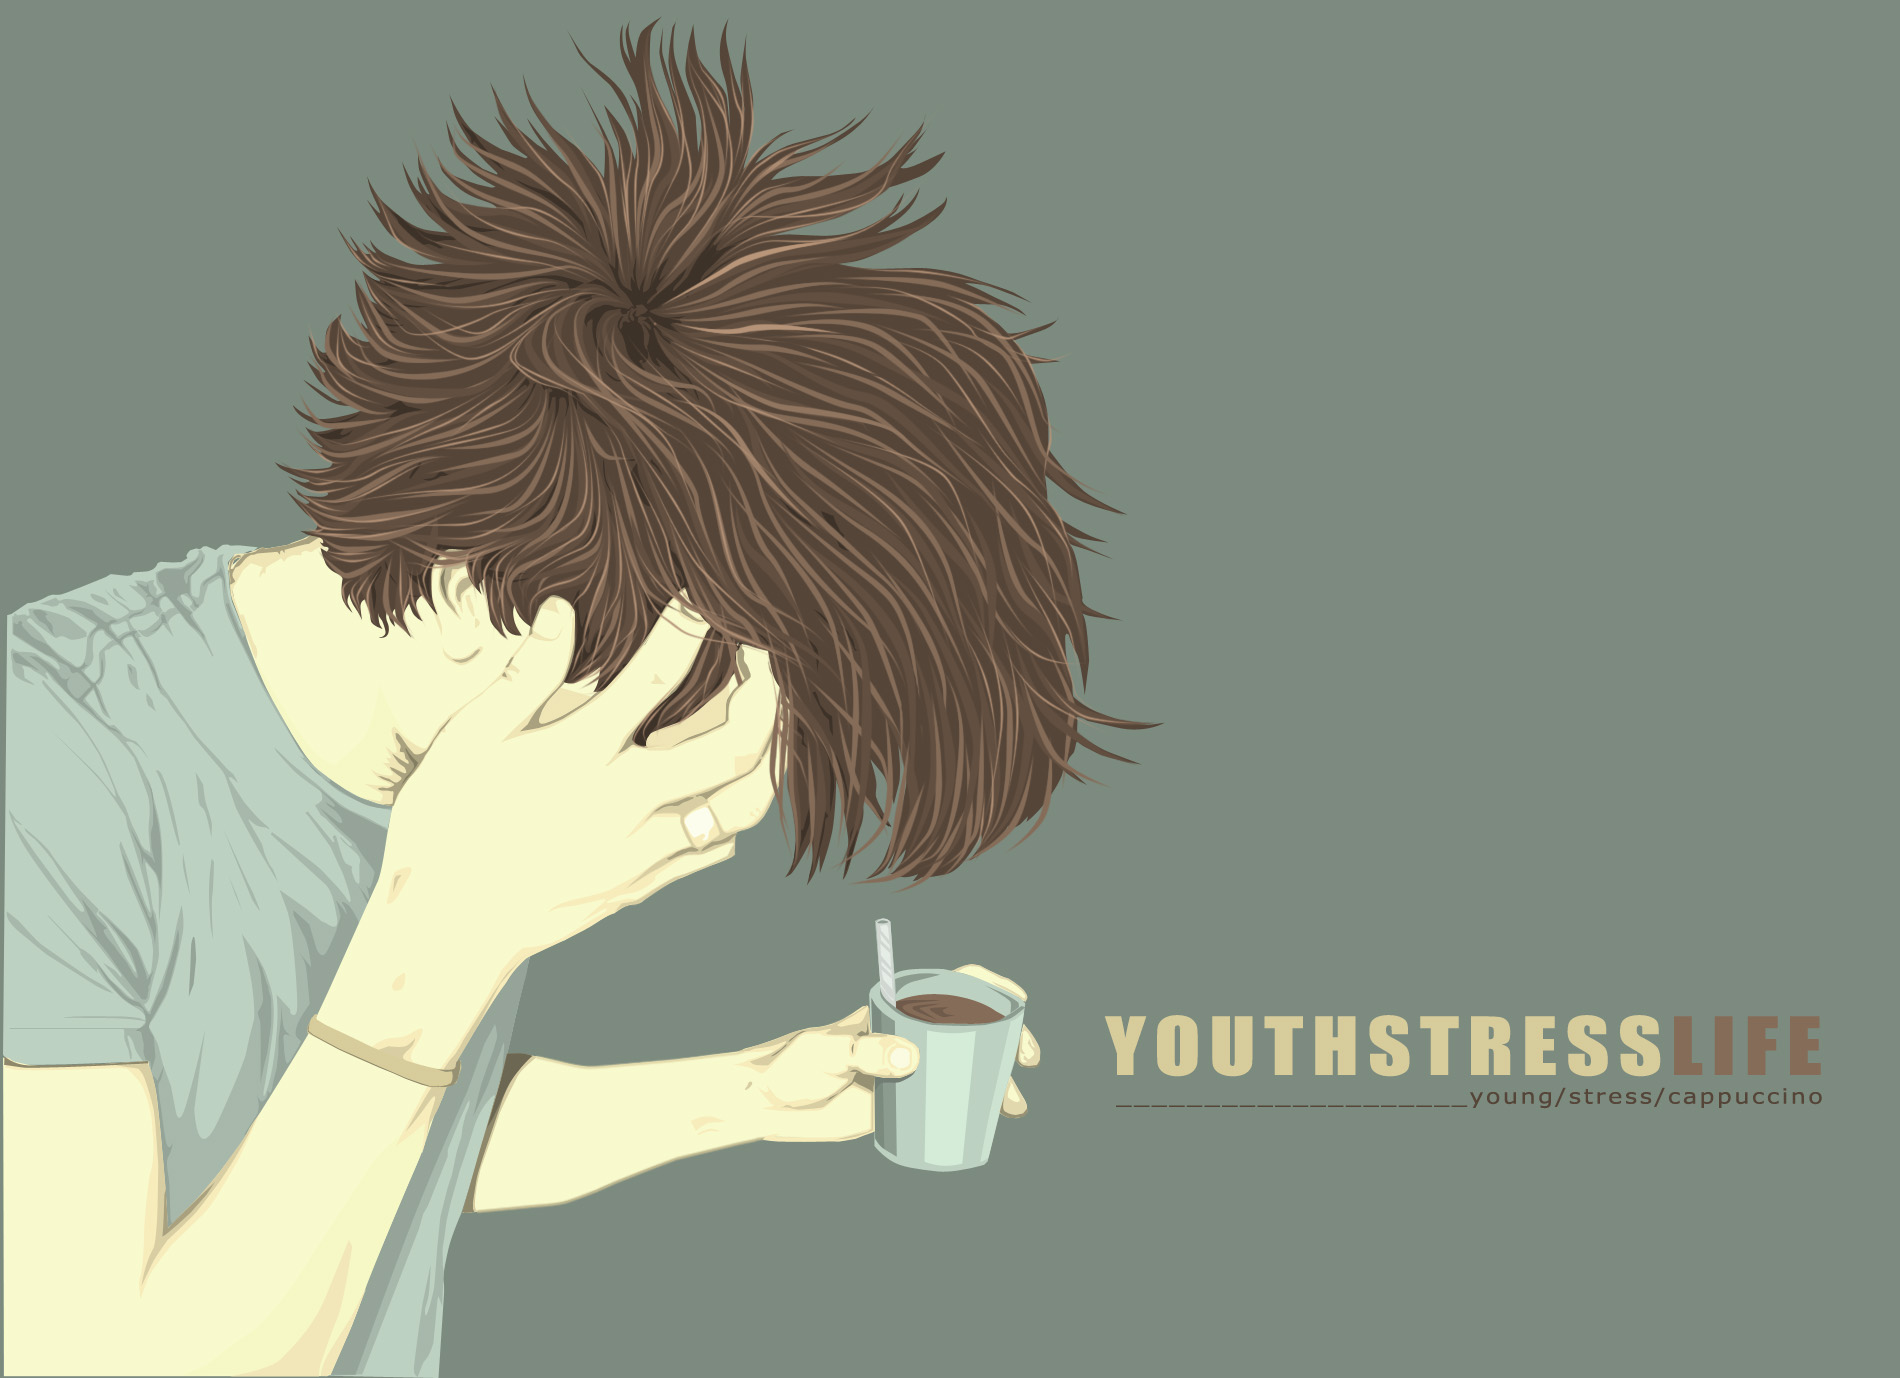 Youth n Stress by ghiand